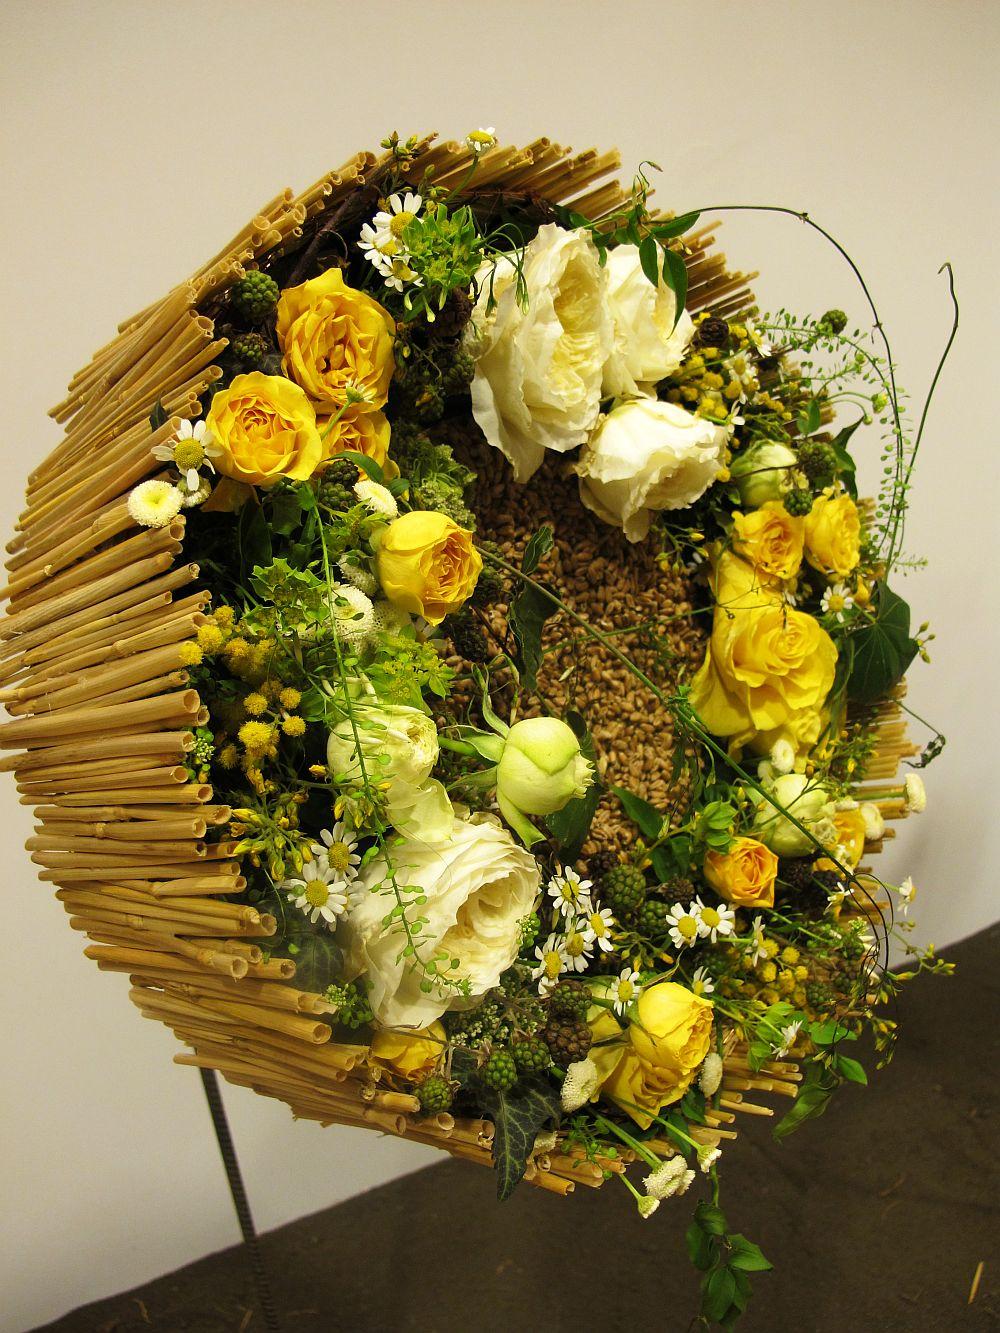 adelaparvu.com about Romanian wedding theme, Floraria Iris stand, floral designer Nicu Bocancea (13)